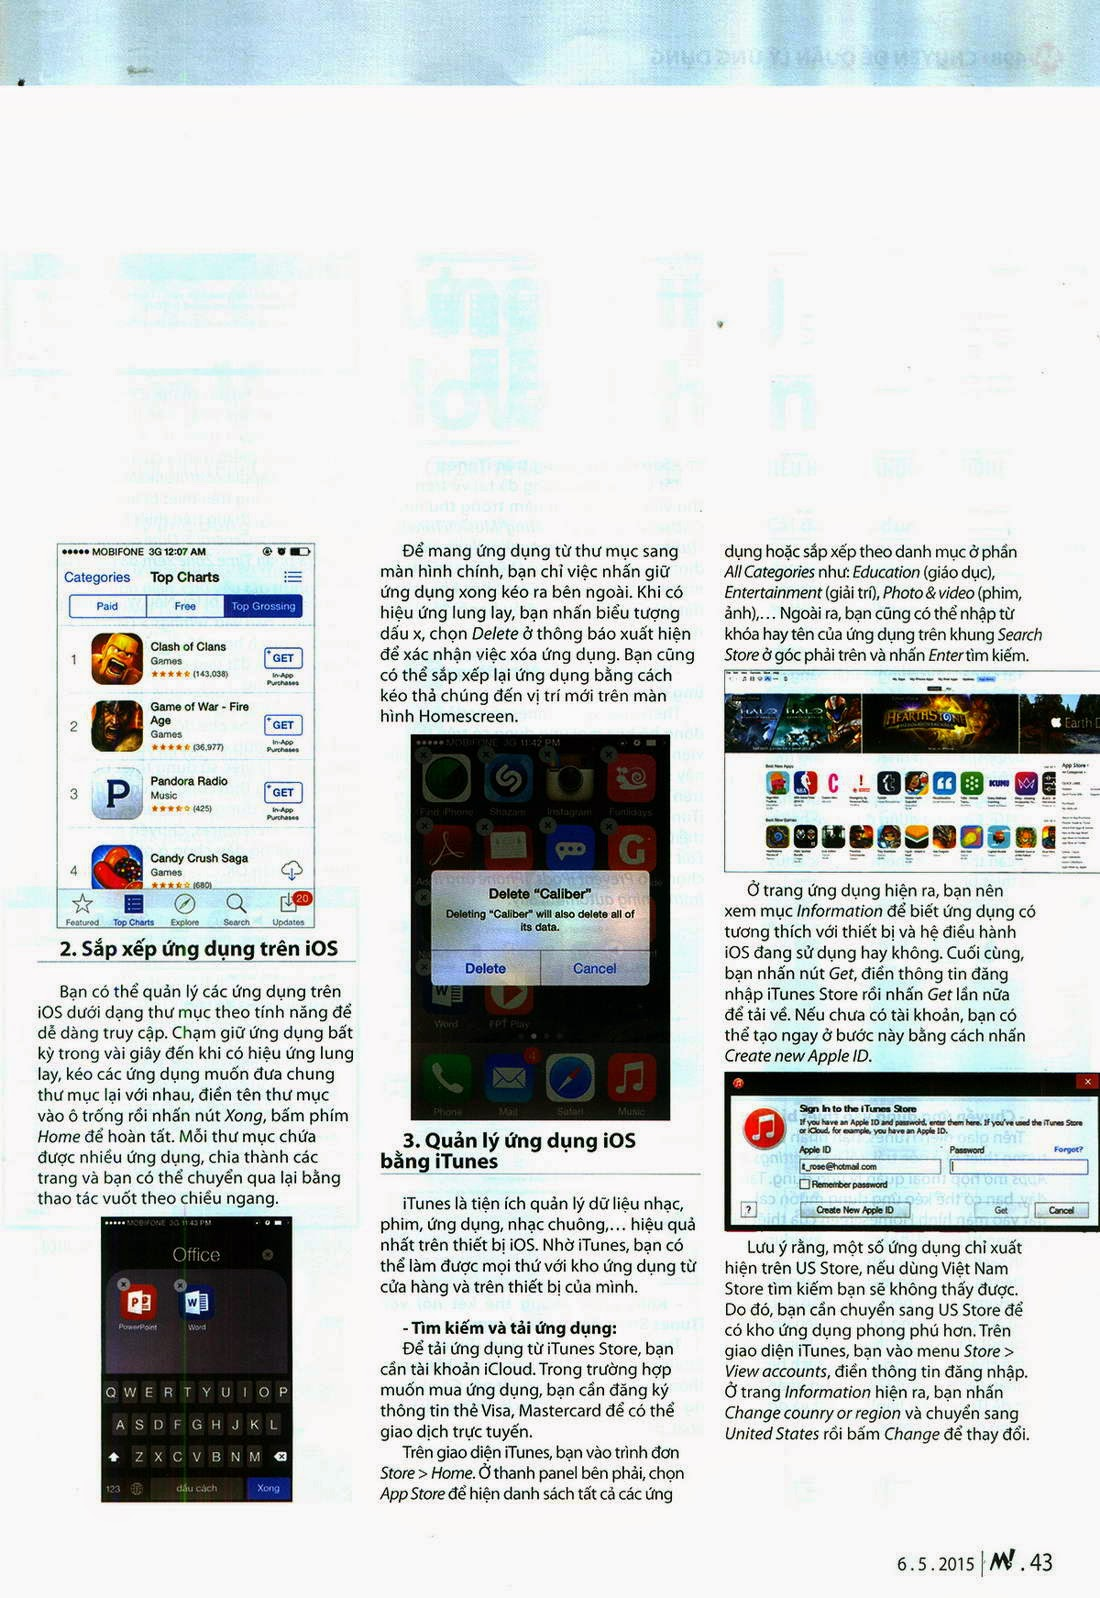 EChip Mobile 498 tapchicntt.com